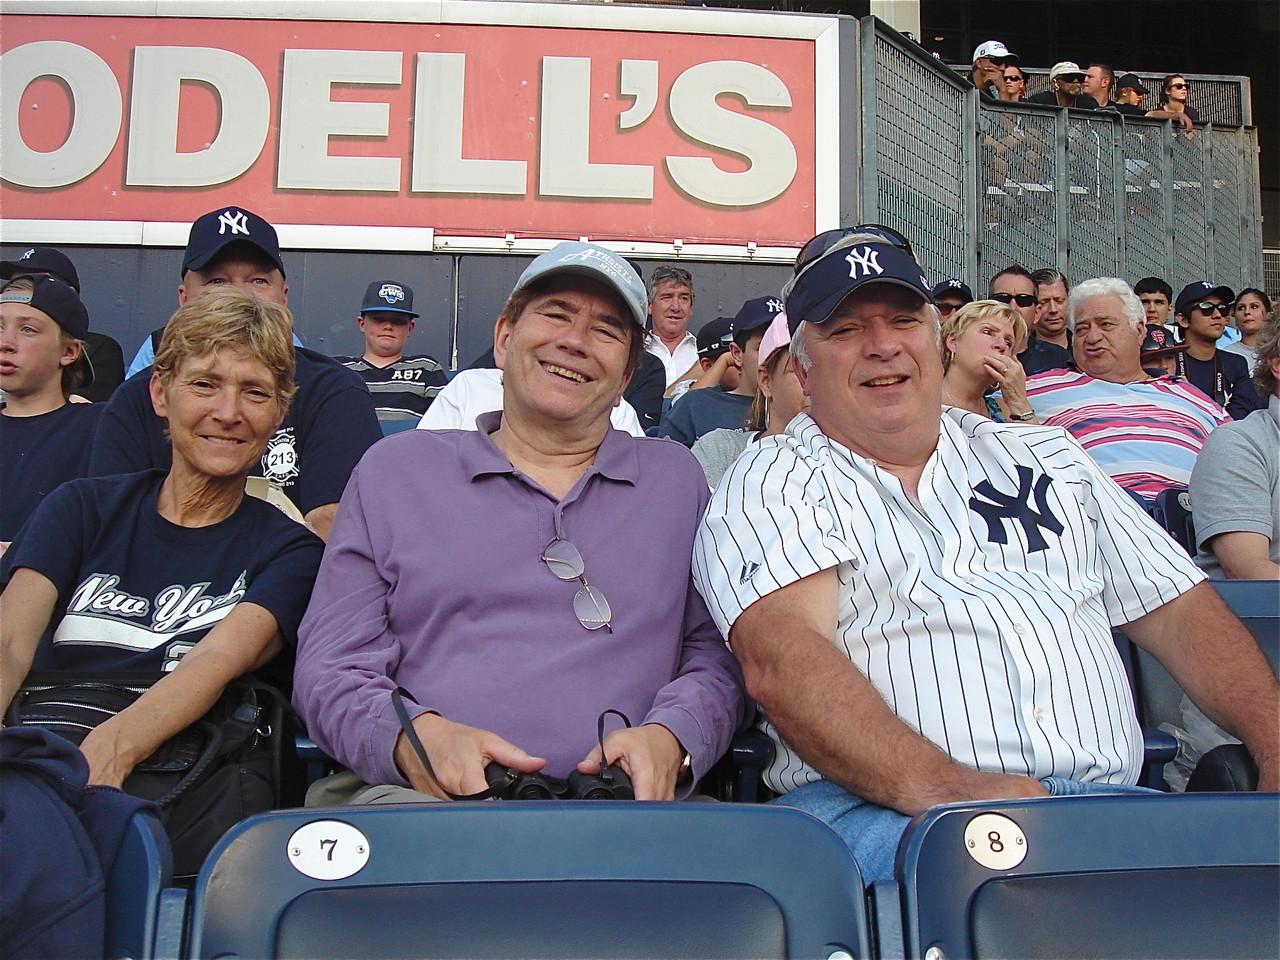 John & his cousin Steve Theisen & Steve's wife Sue